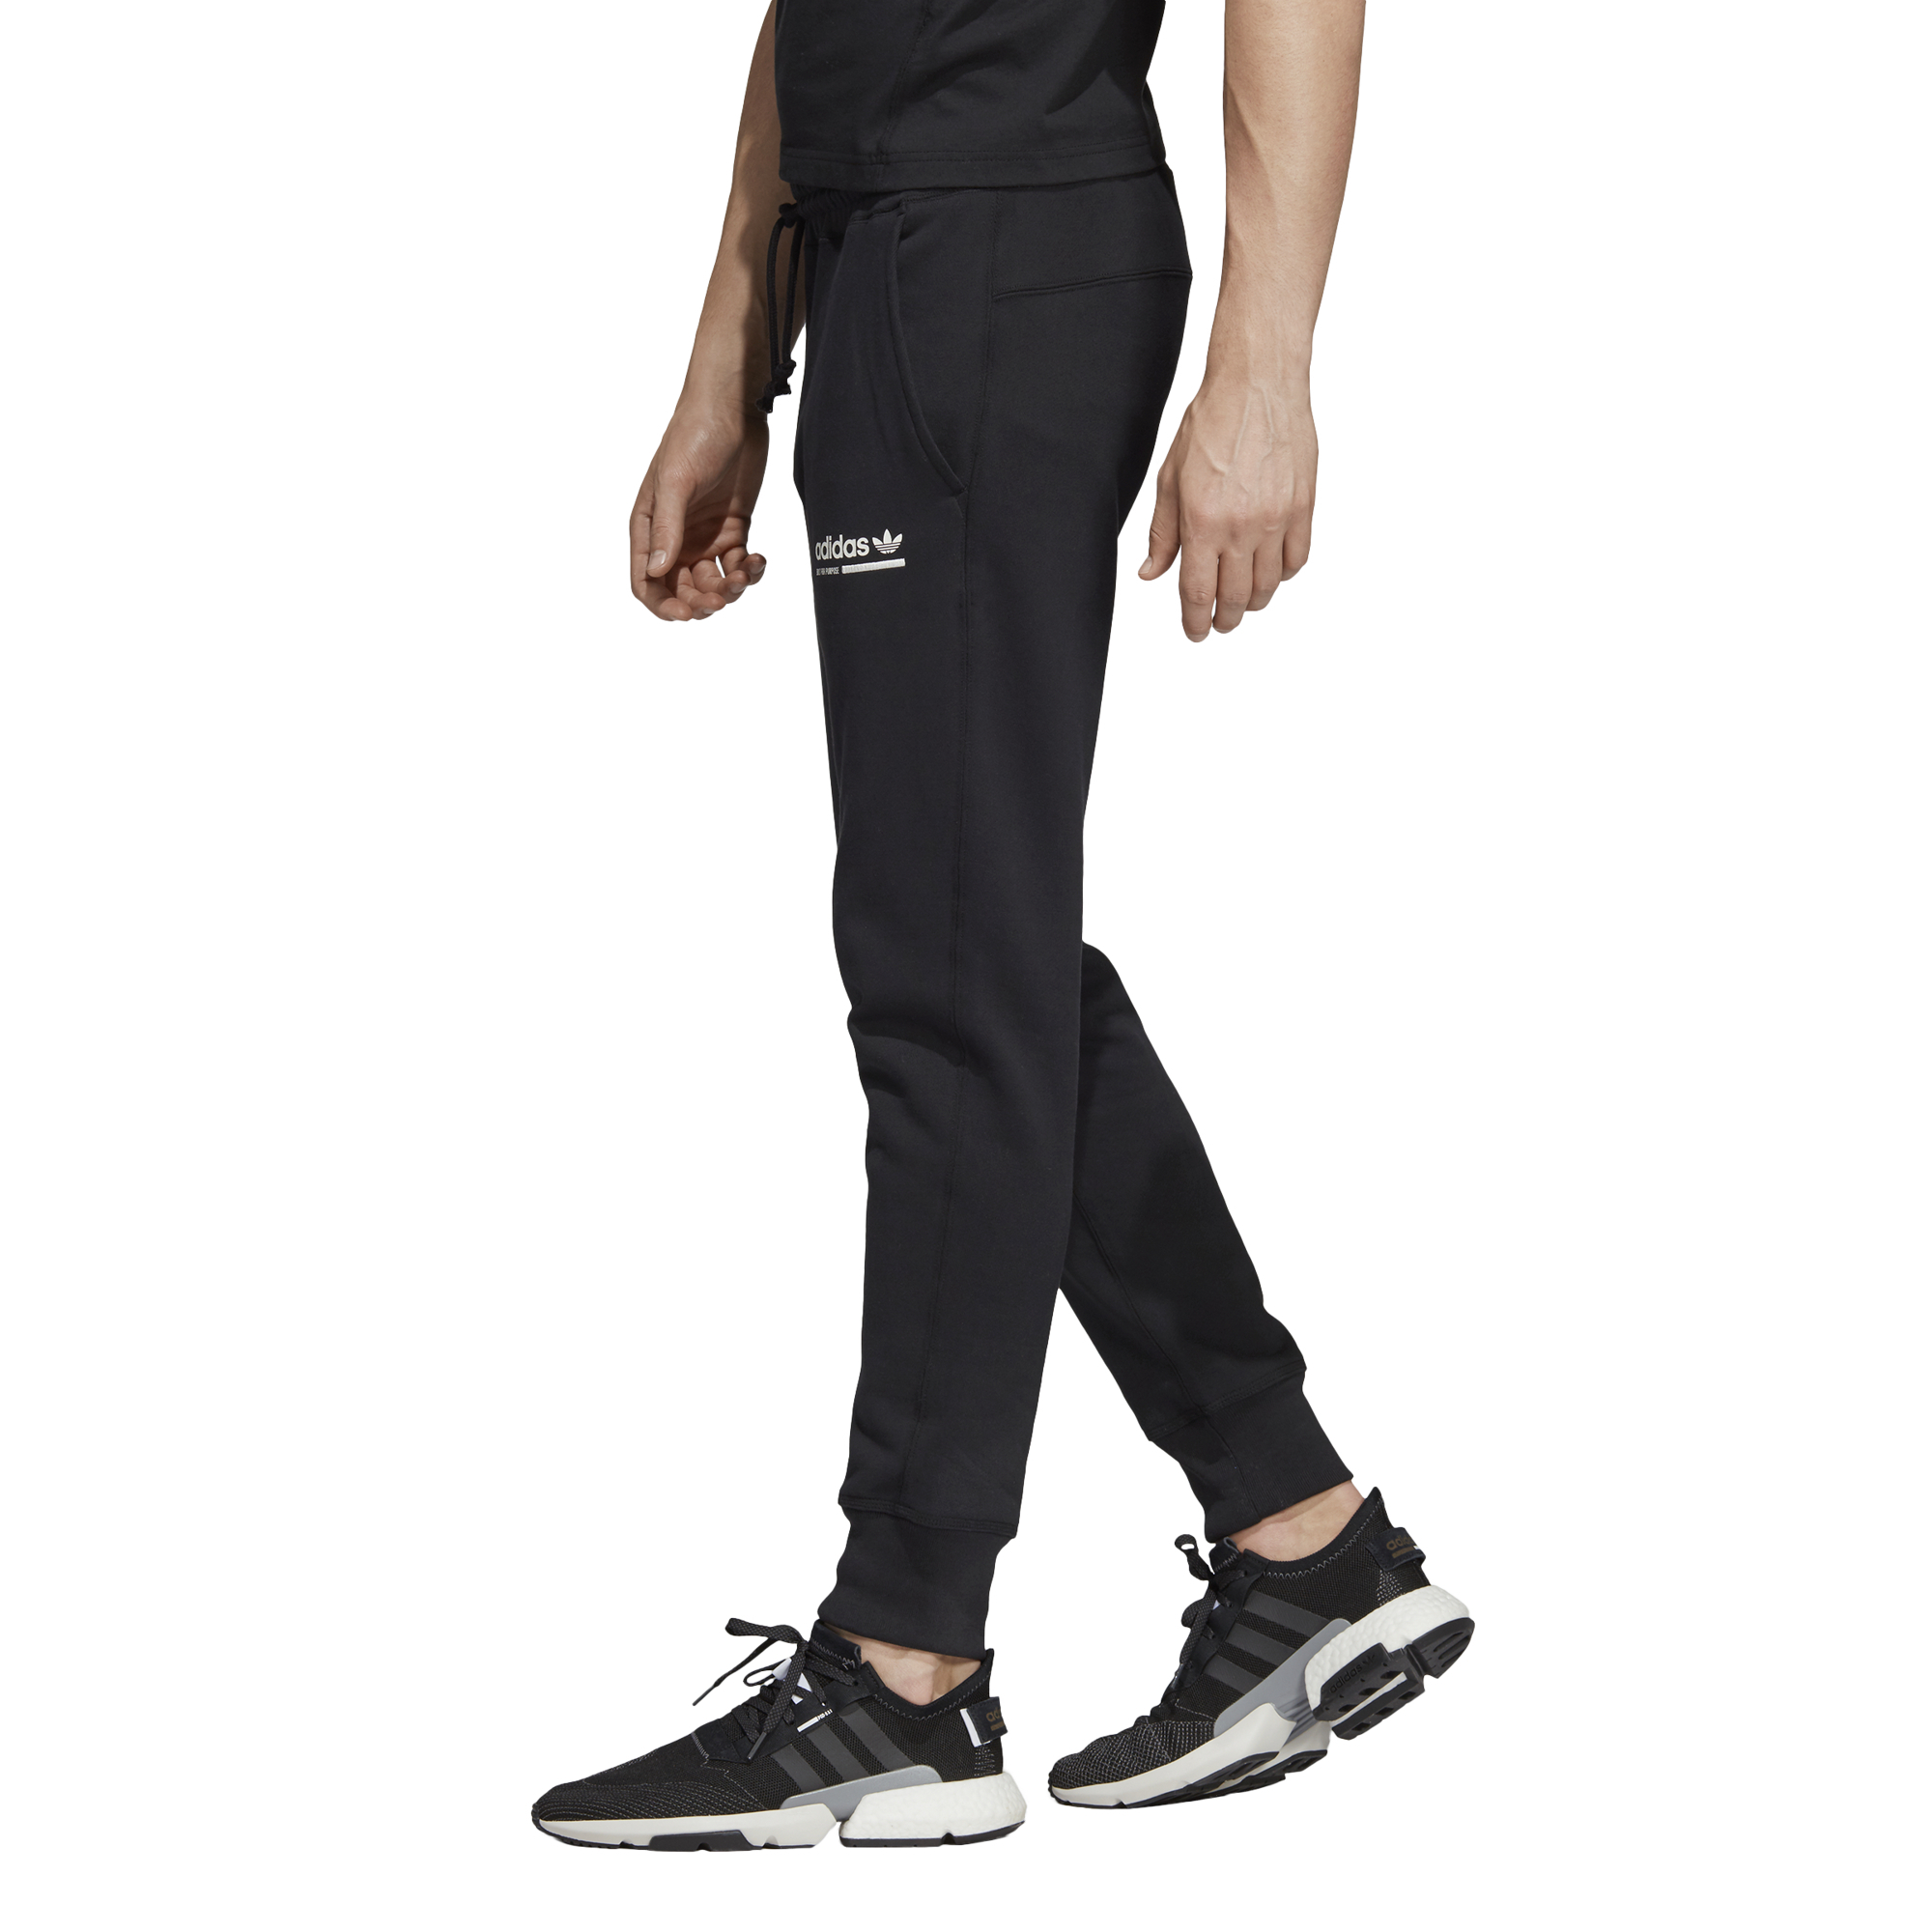 Pantalon de survêtement adidas Kaval logo